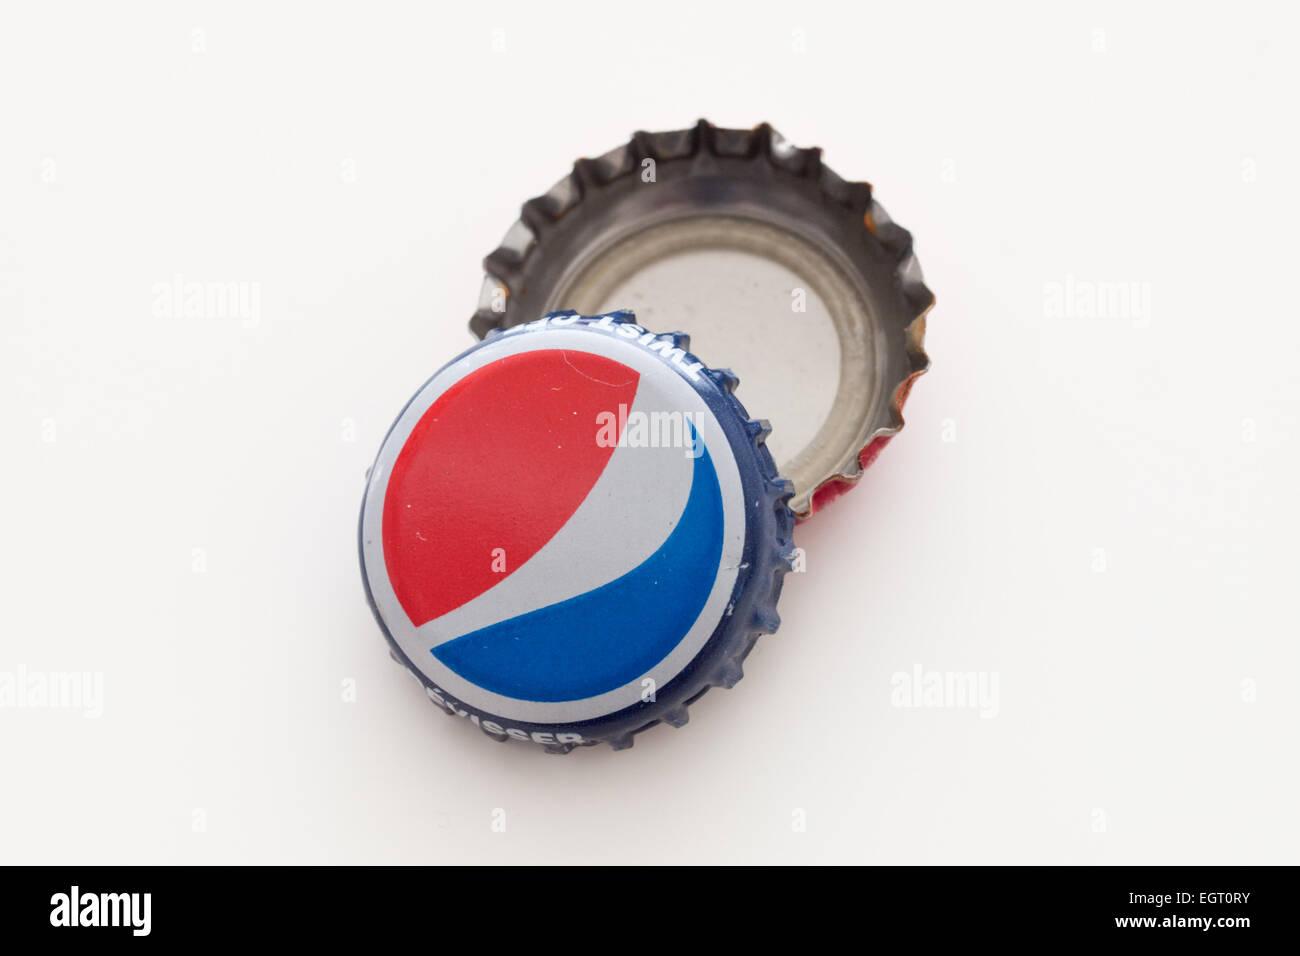 A Pepsi bottle cap (Pepsi bottle caps). - Stock Image